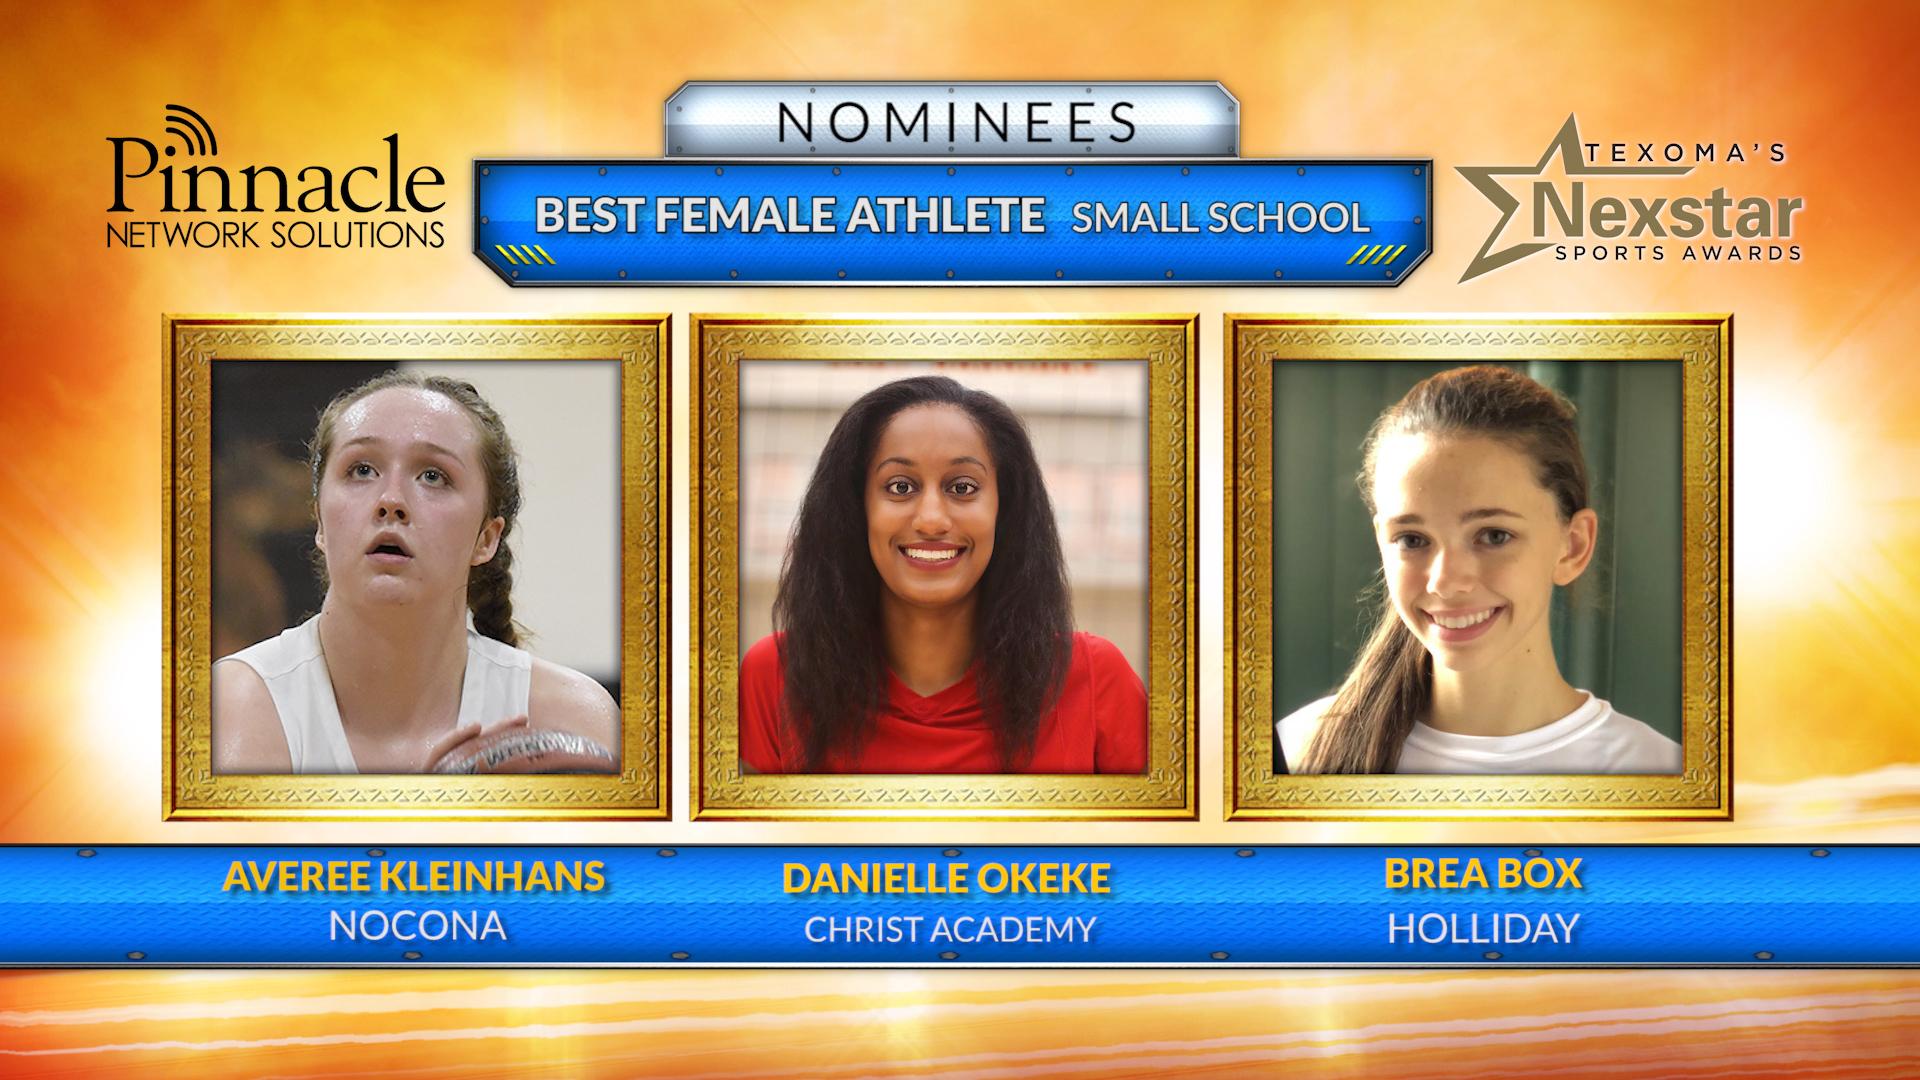 best female athlete small school_1559961177618.jpg.jpg